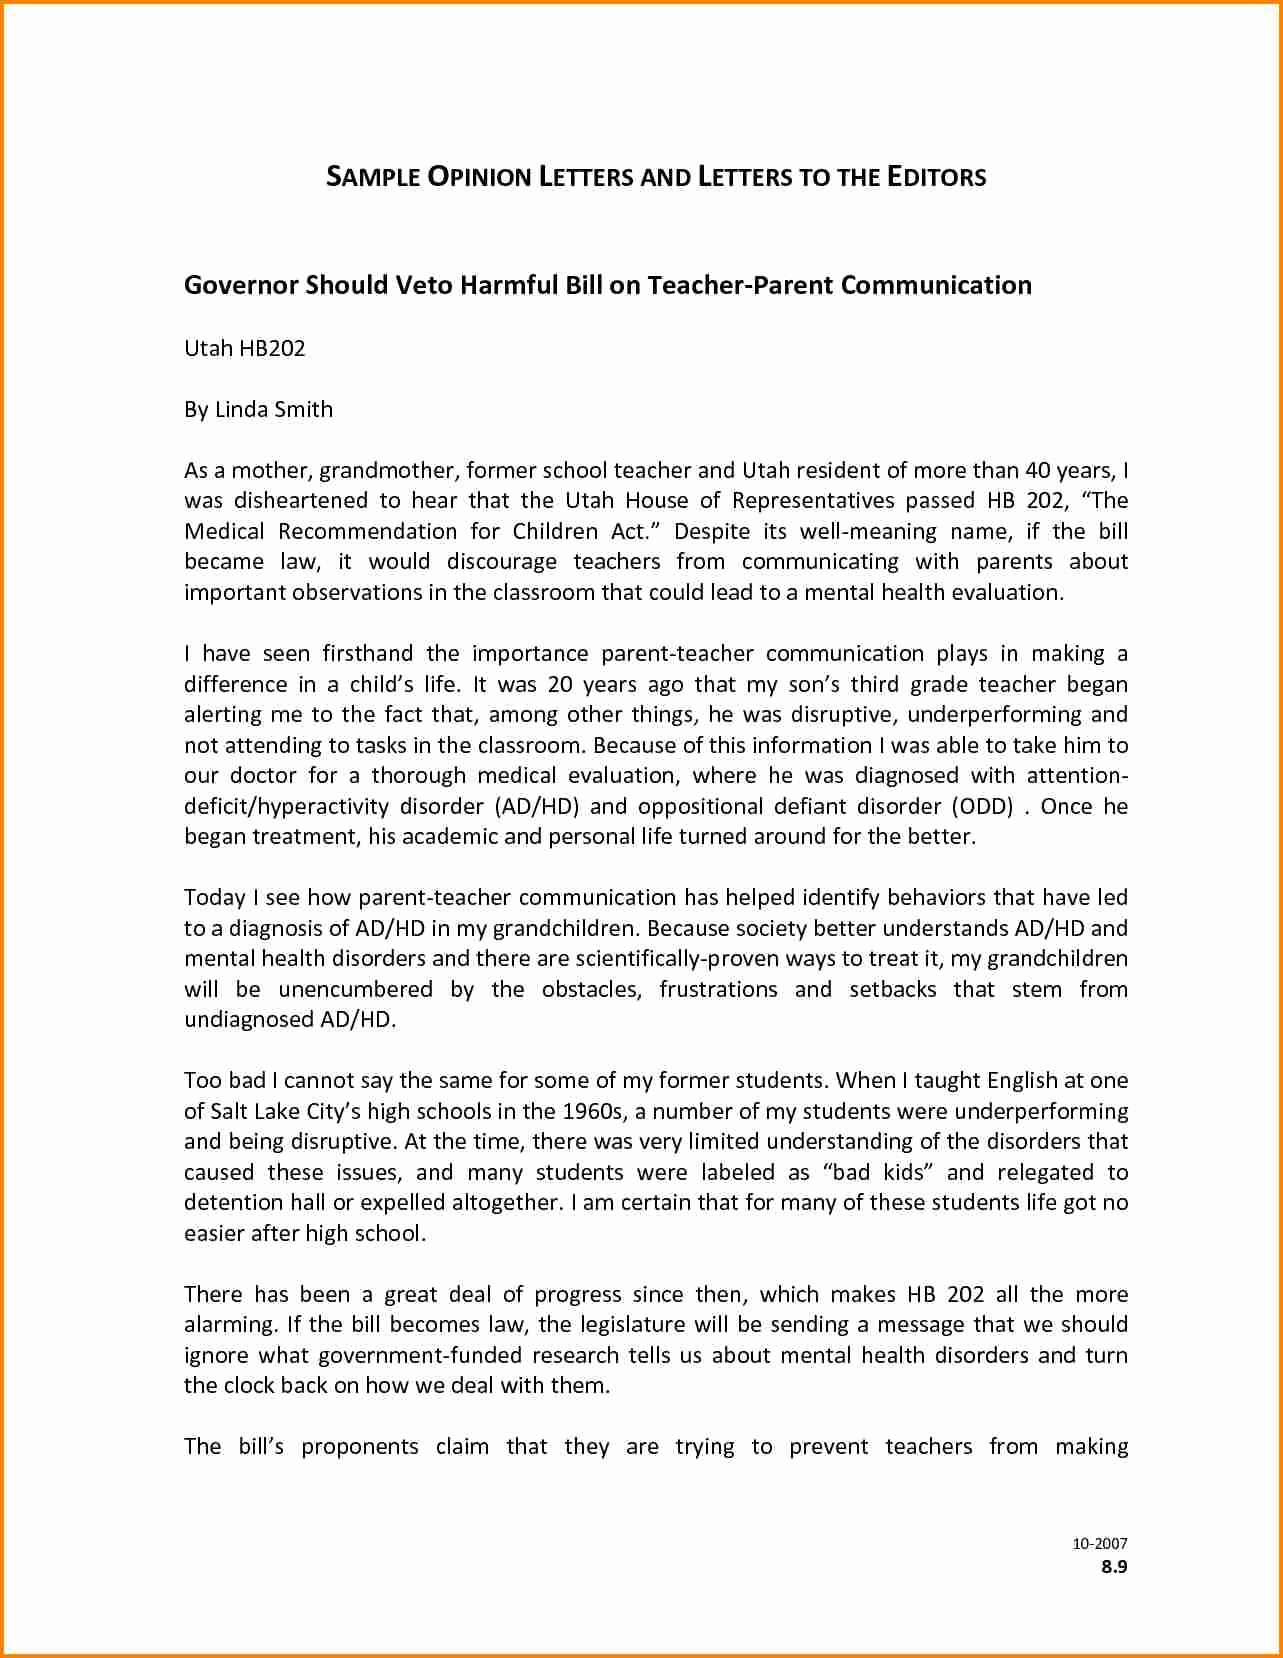 Medical School Letter Of Recommendation Best Of 9 Medical School Letter Of Re Mendation Examples